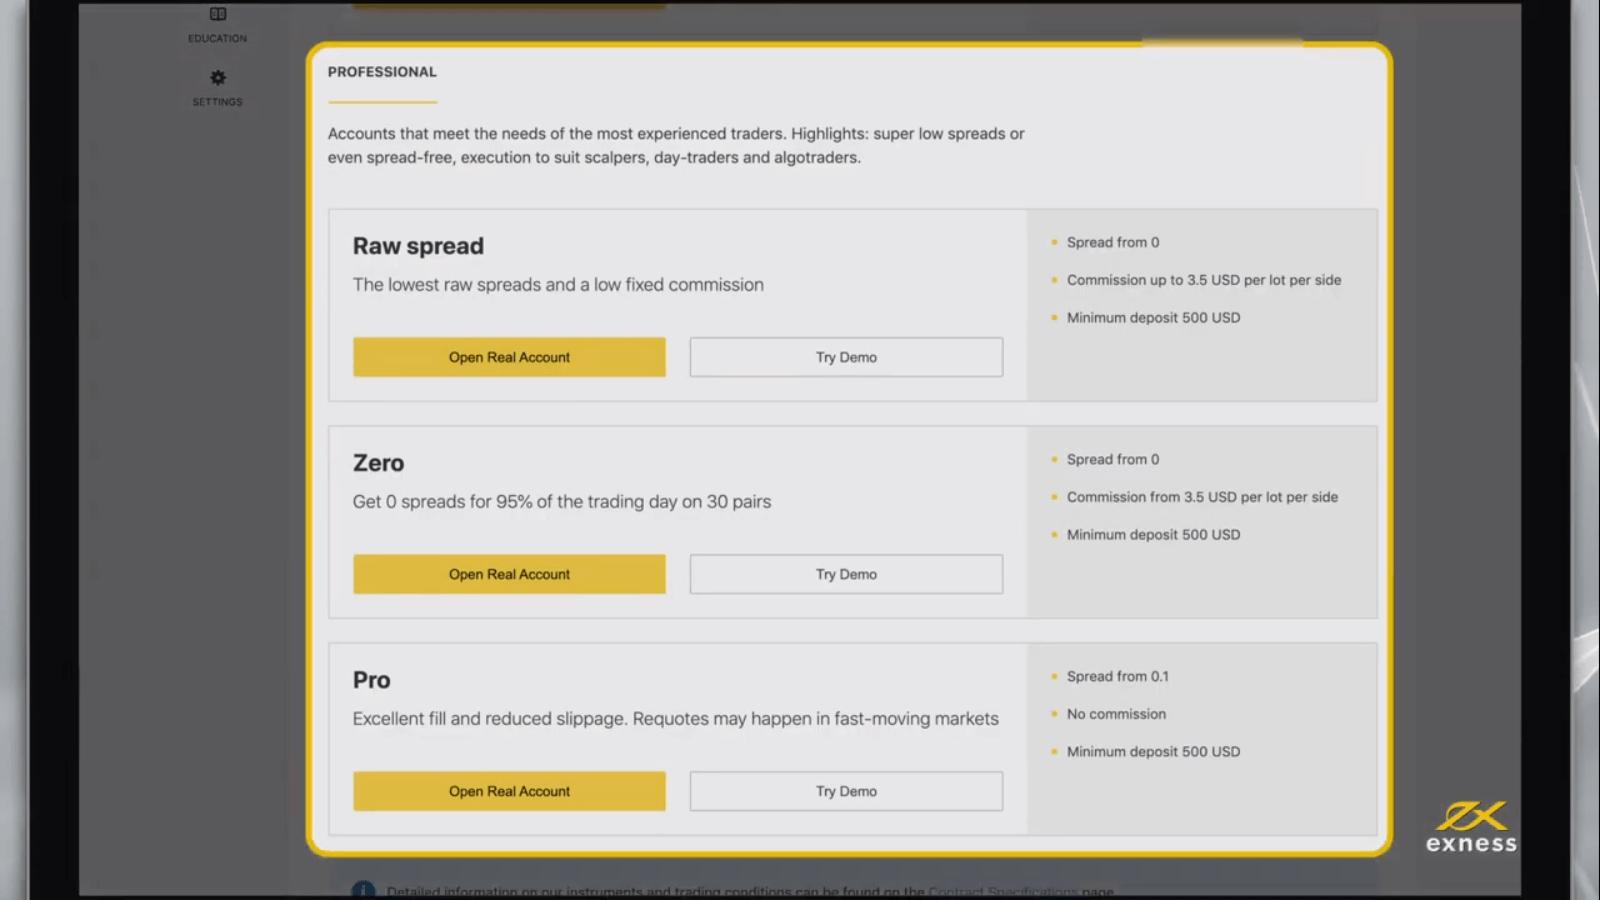 Exness میں ٹریڈنگ اکاؤنٹ کو رجسٹر اور کھولنے کا طریقہ